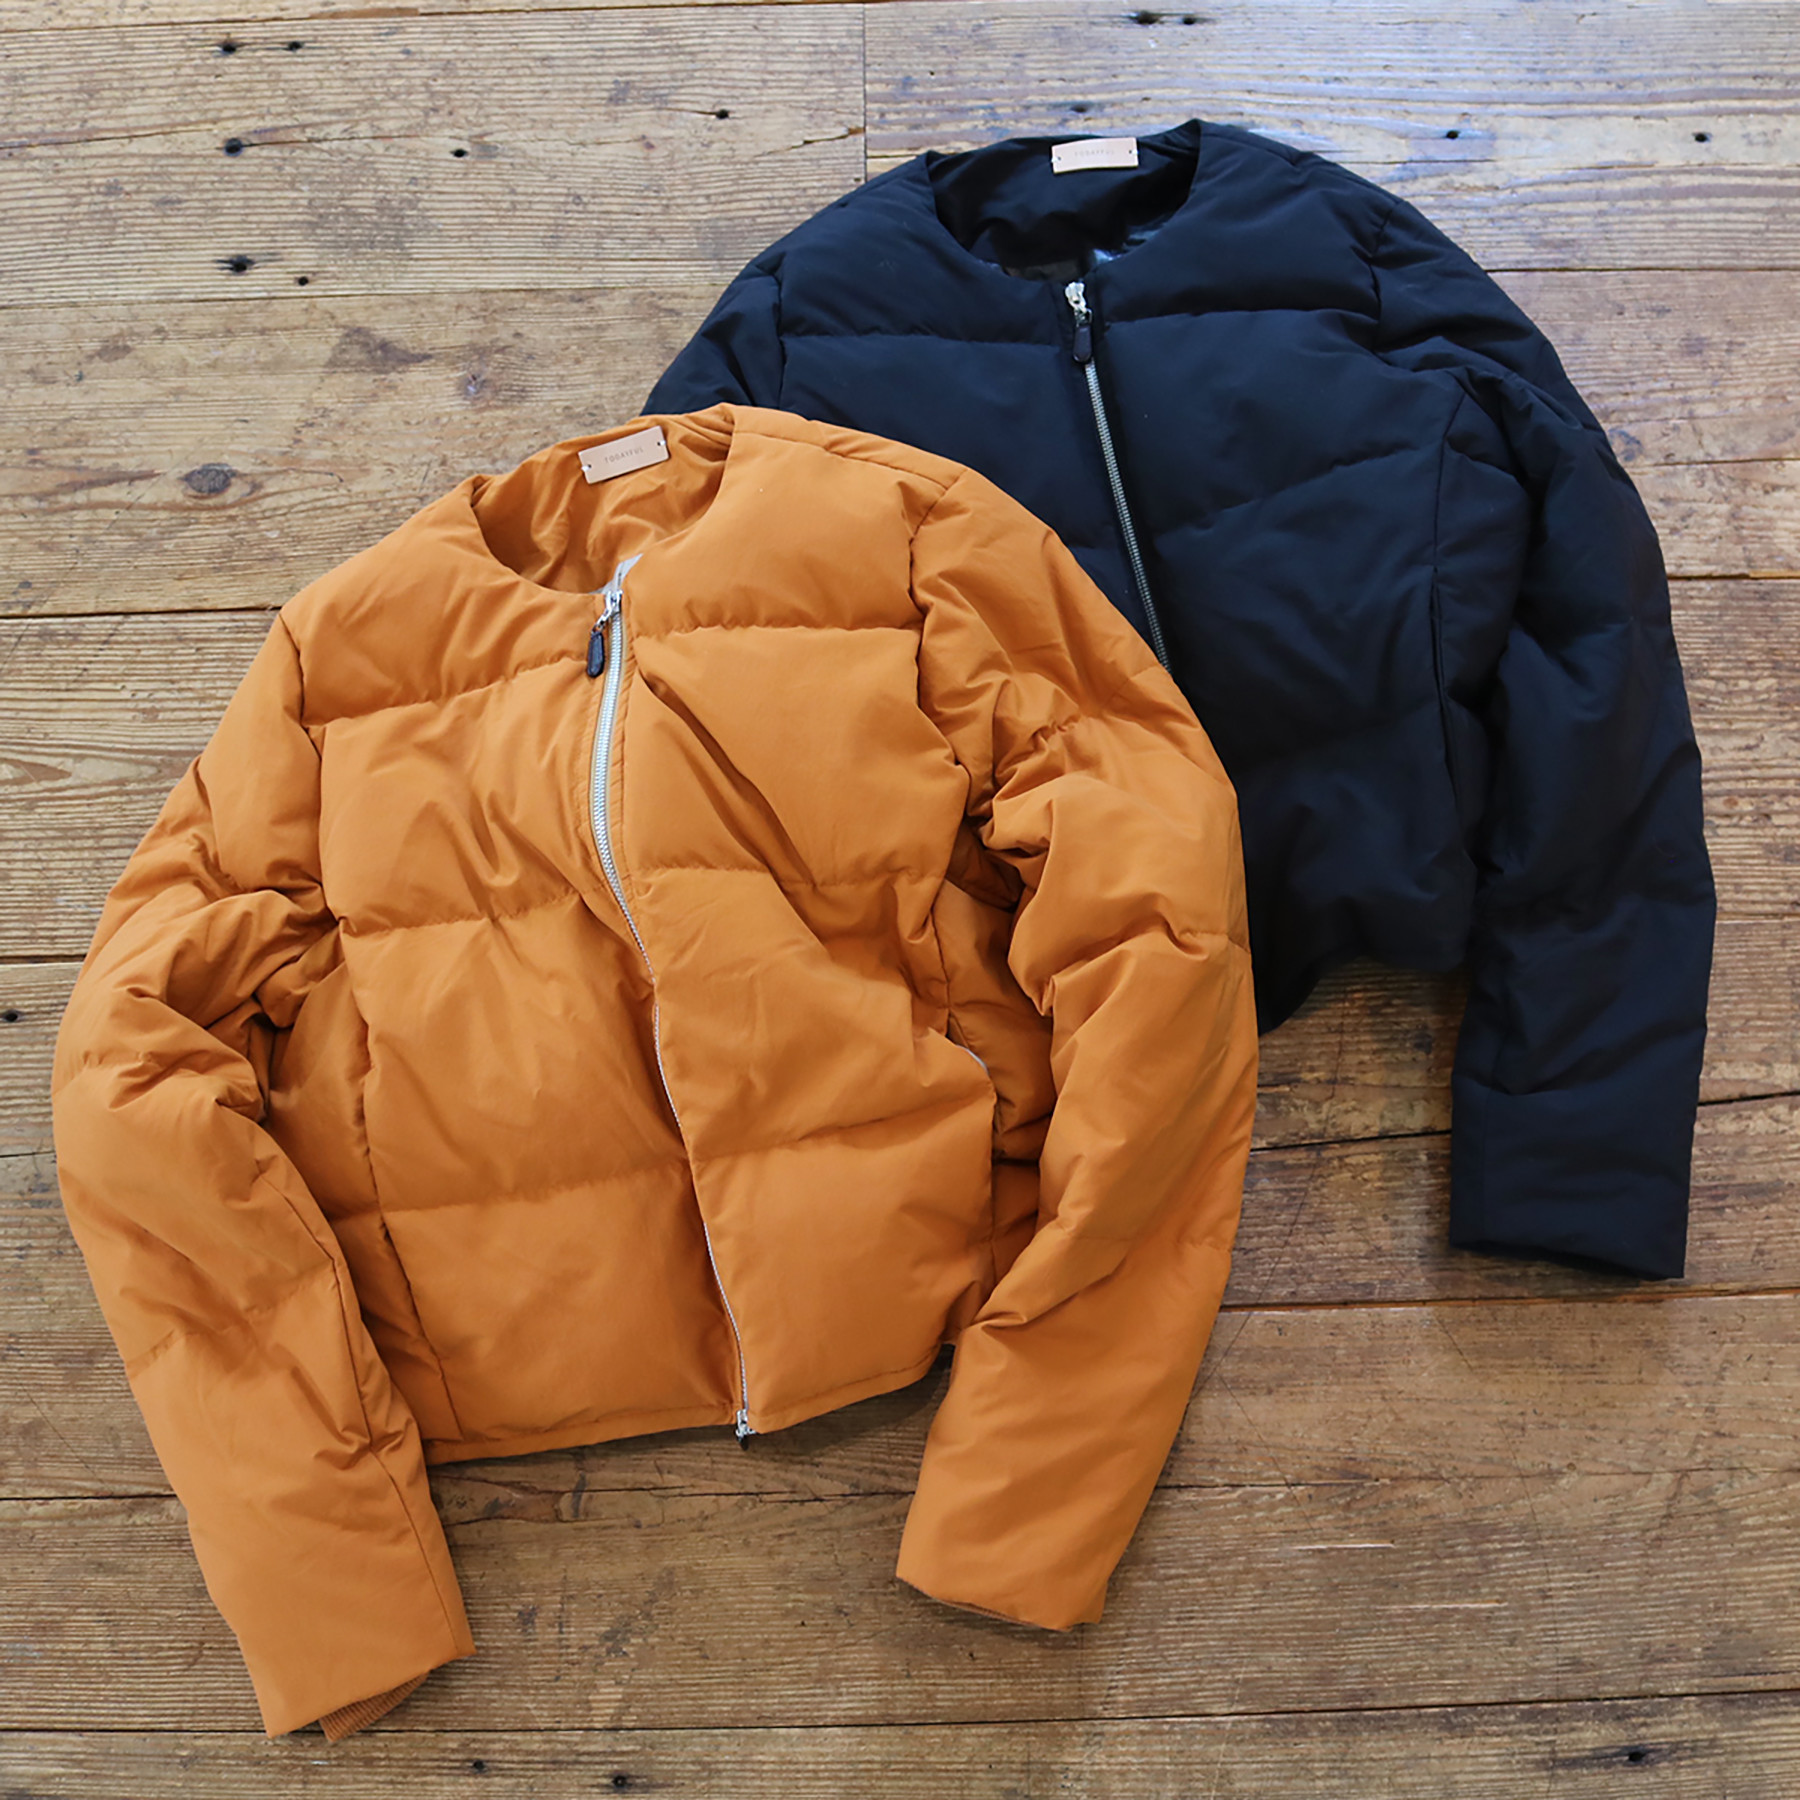 Cocoon Down Jacket